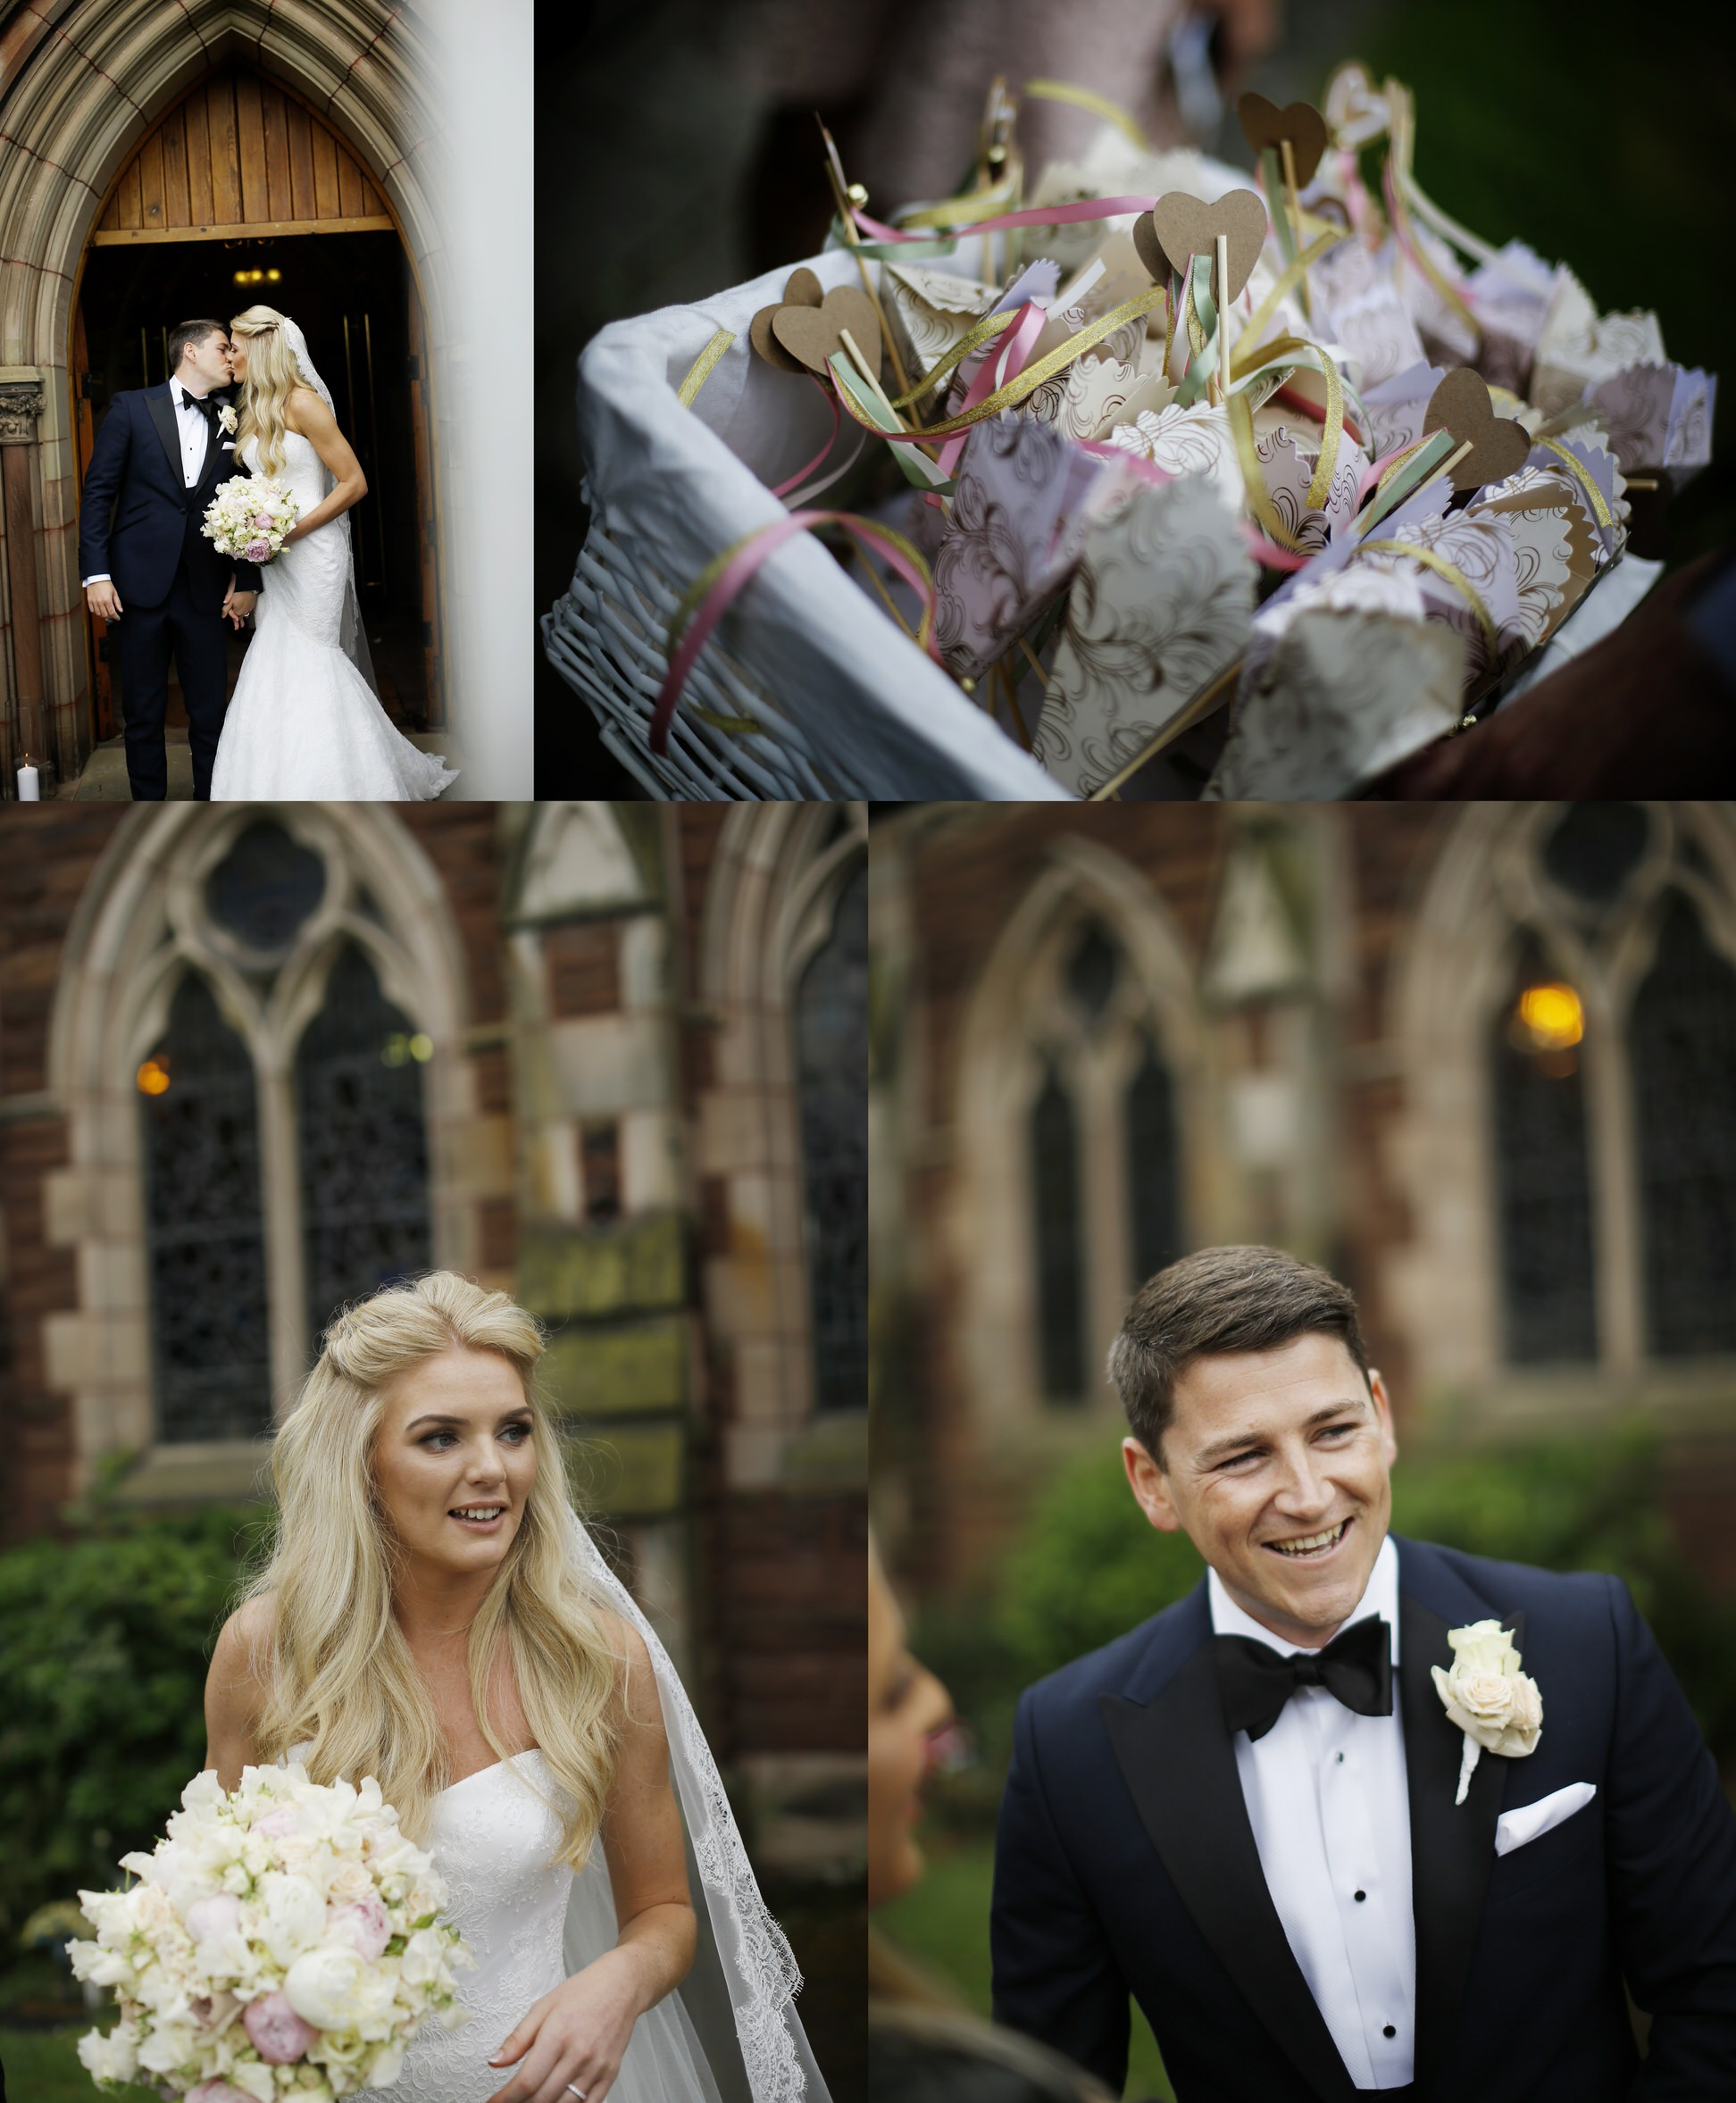 cheshire-wedding-photographer-thornton-manor-weddings_0009.jpg